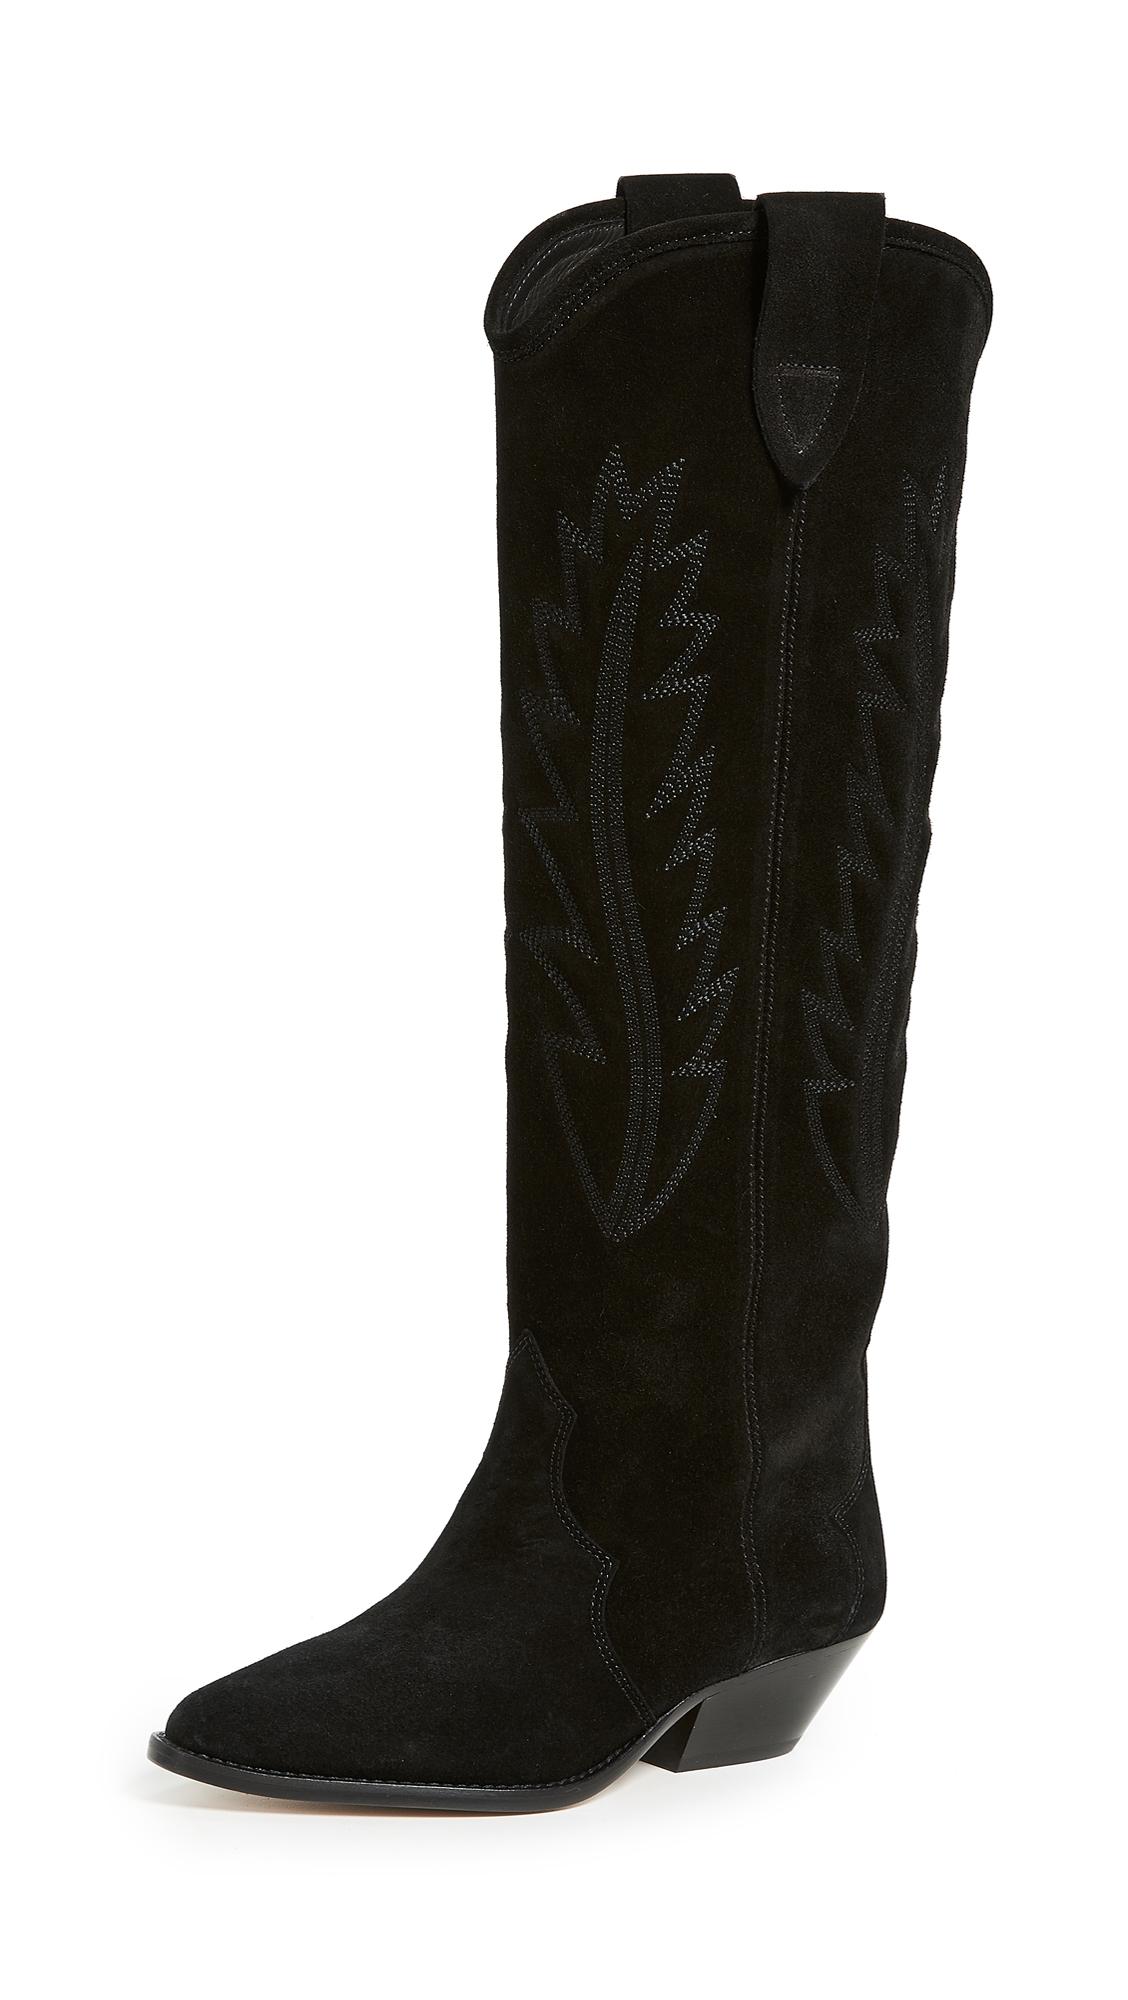 Isabel Marant Denzy Boots - Black